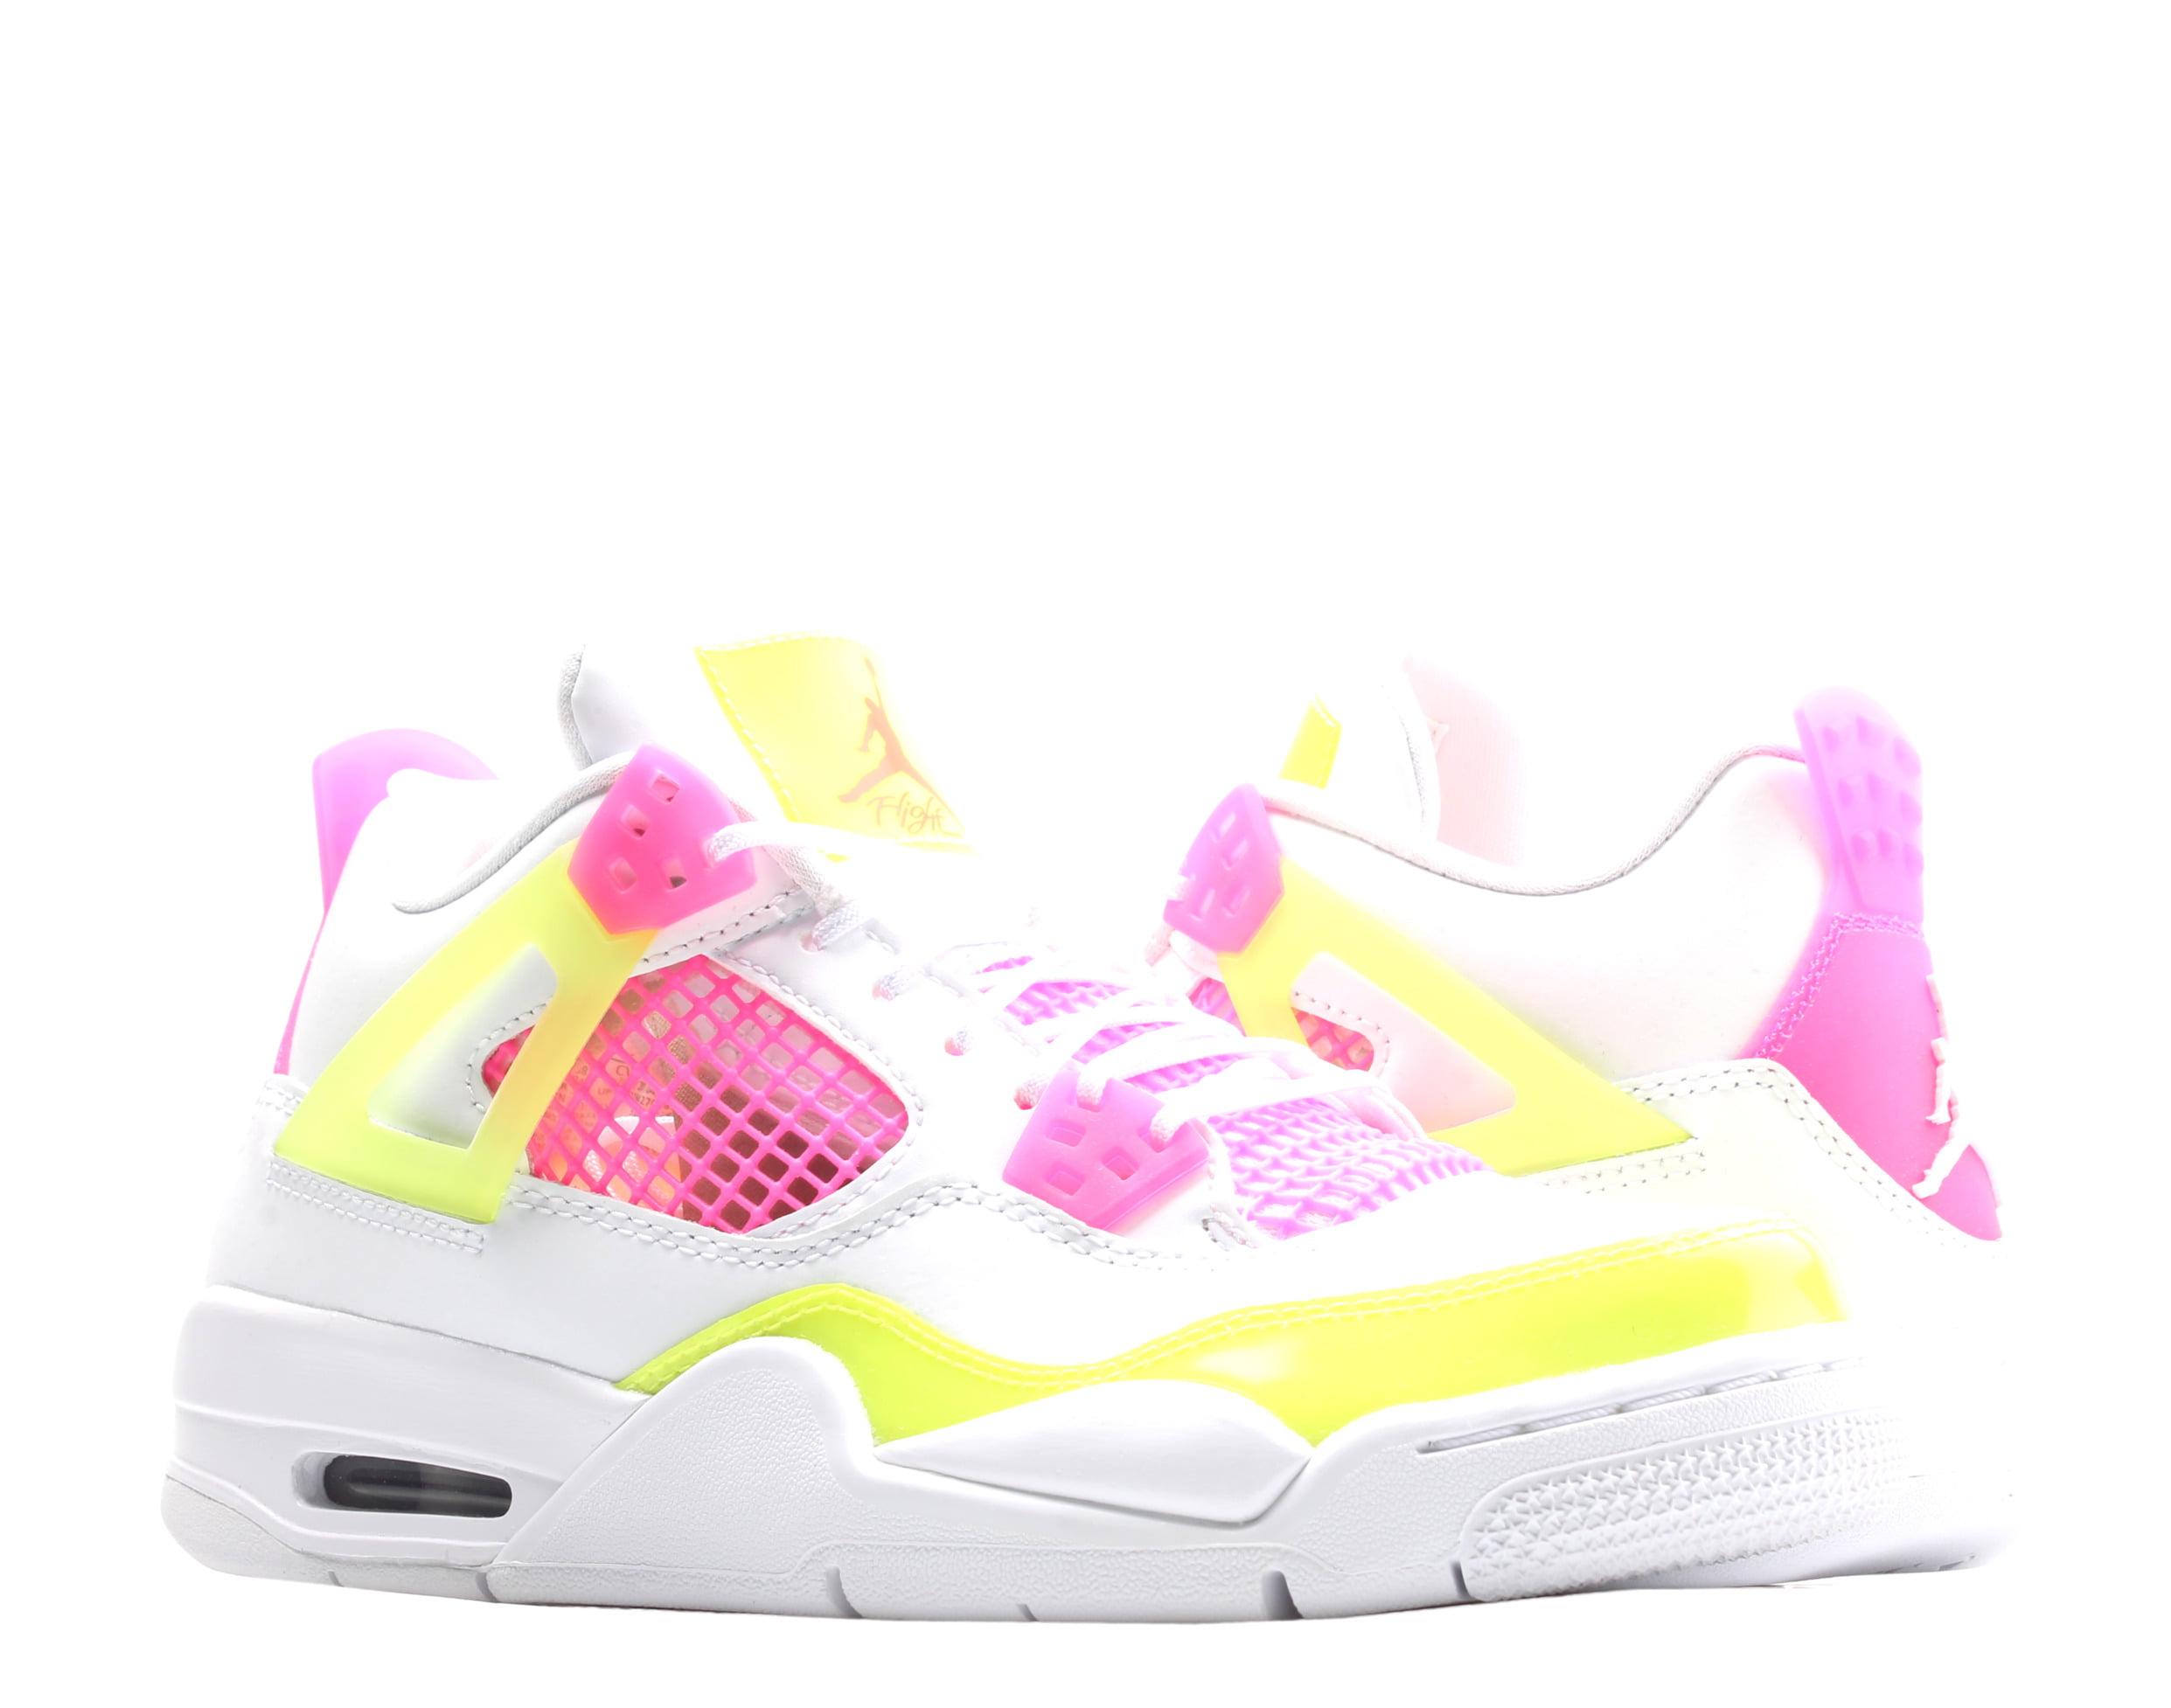 Jordan - Nike Air Jordan 4 Retro SE (GS) White/Lemon-Pink Big Girls Shoes CV7808-100 - Walmart.com